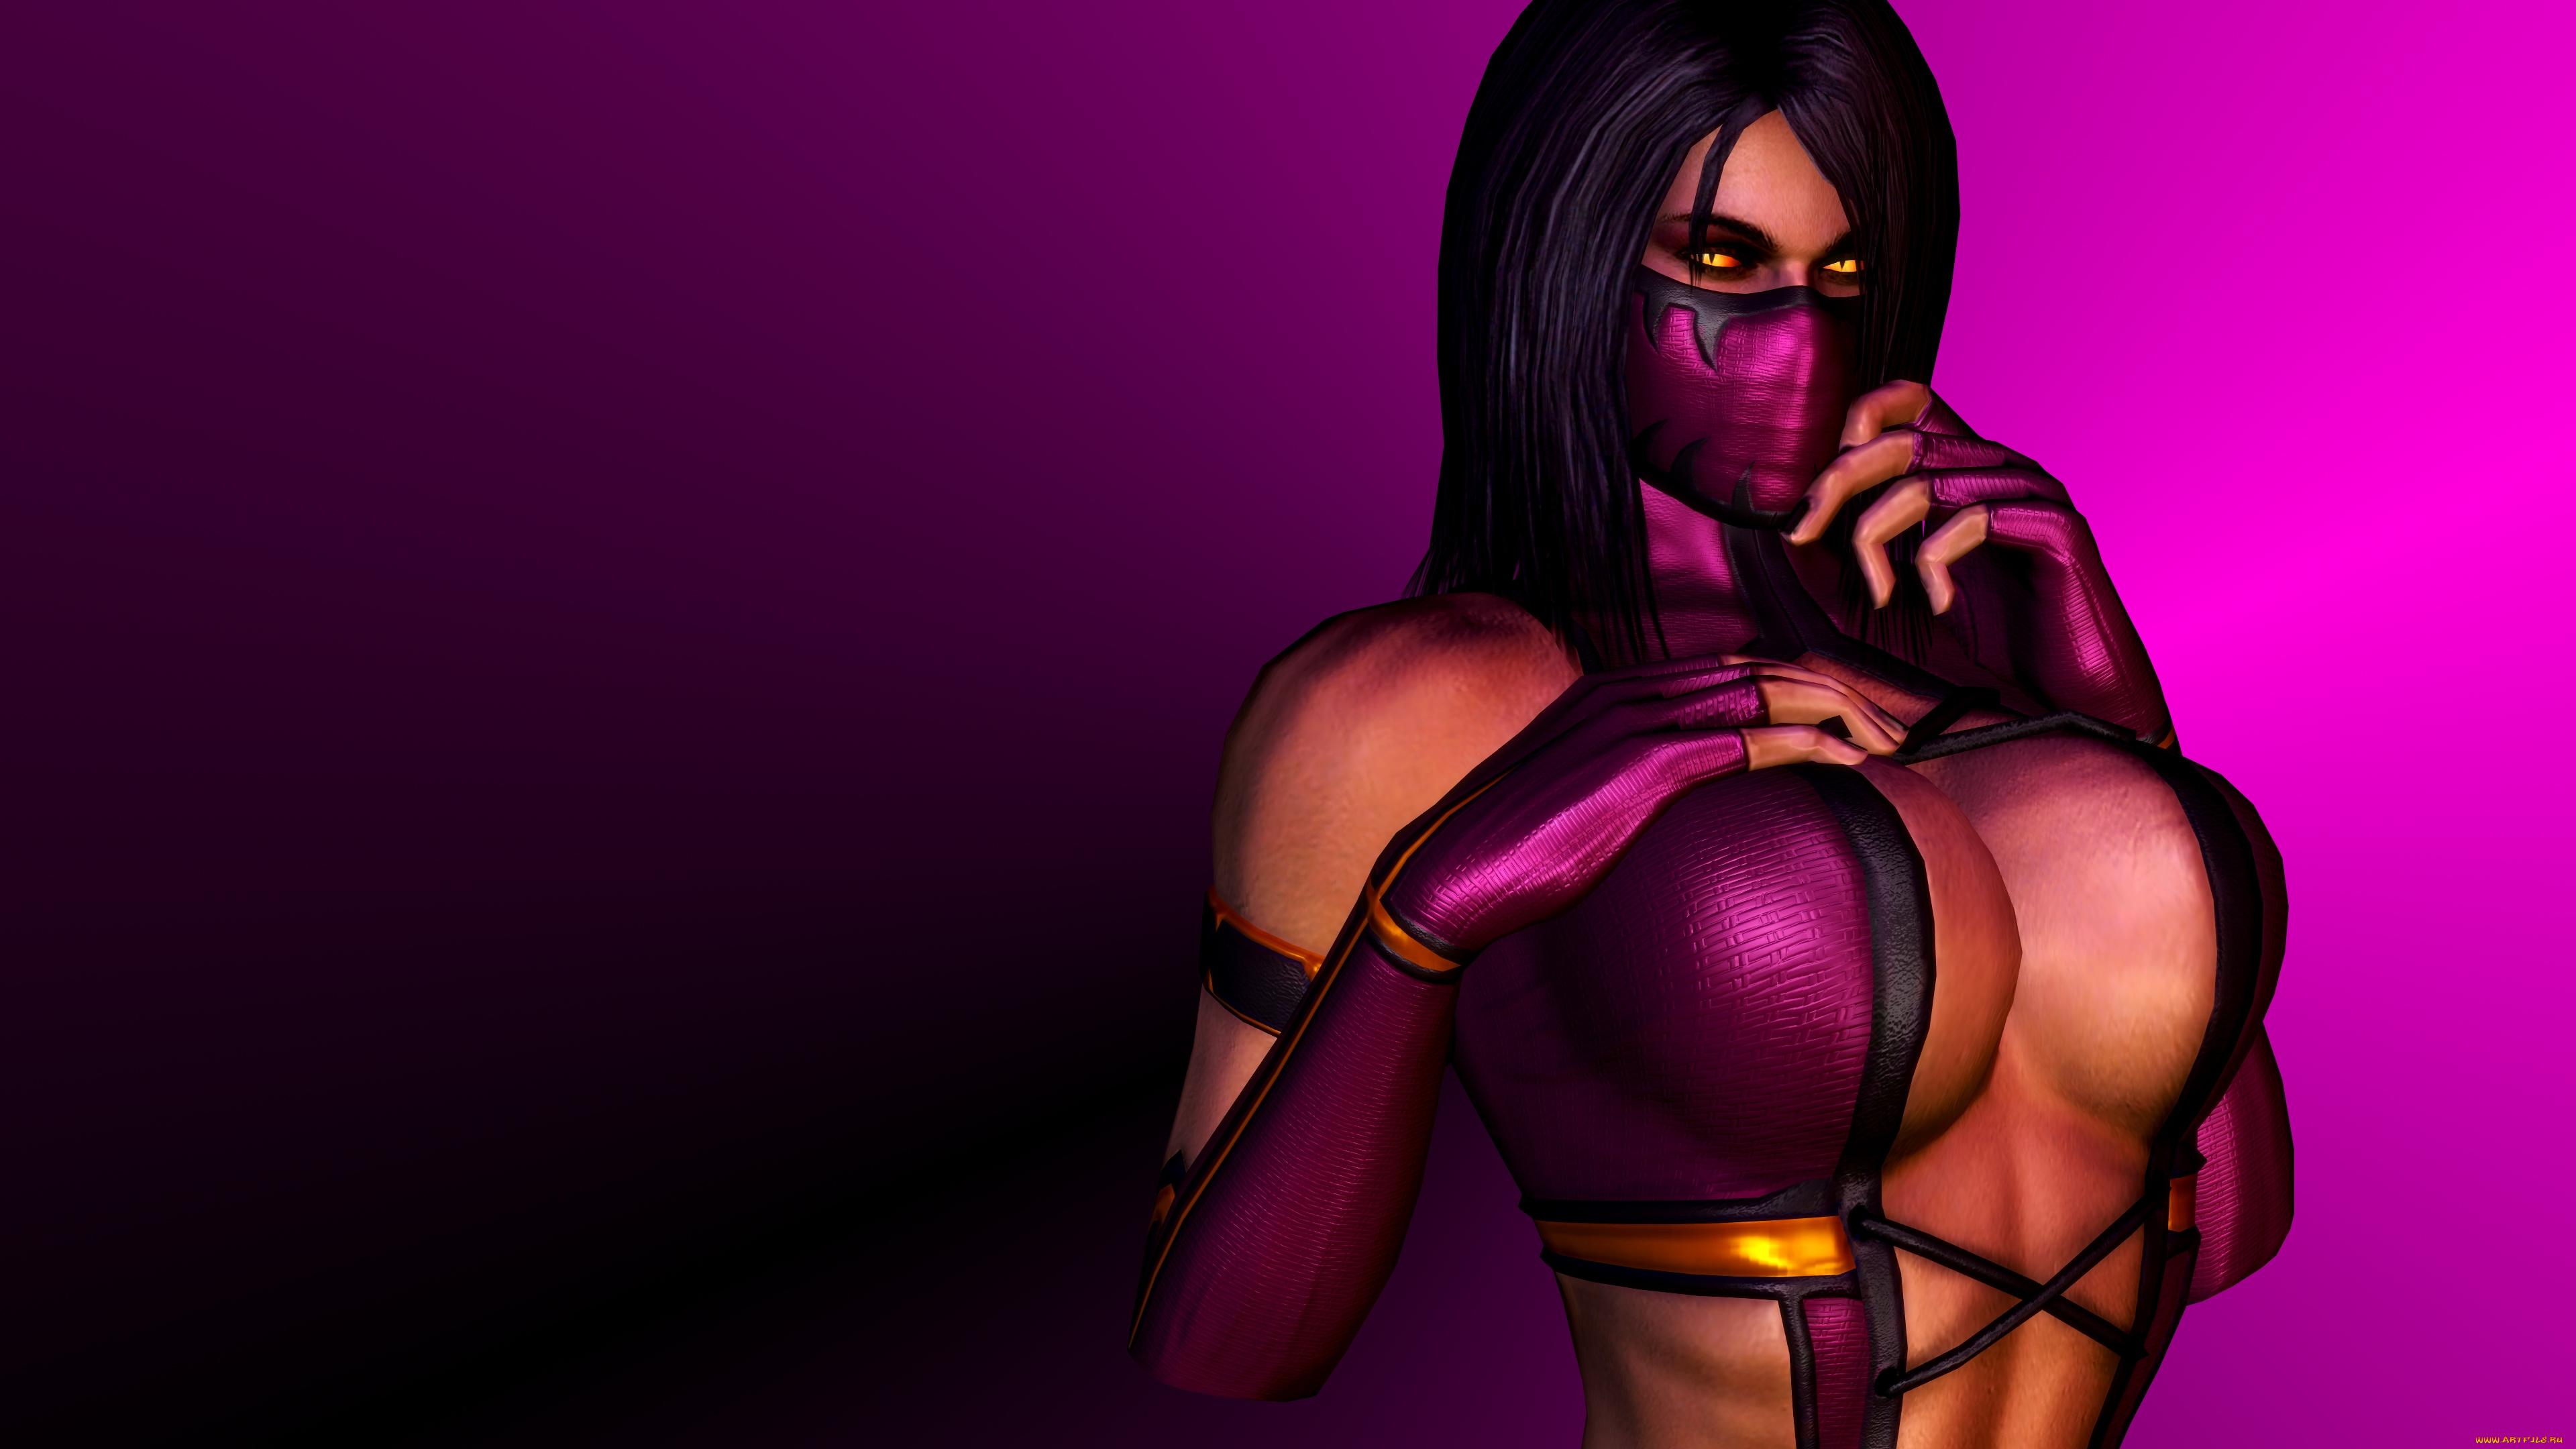 Mortal kombat sex porn henatai video xxx clip